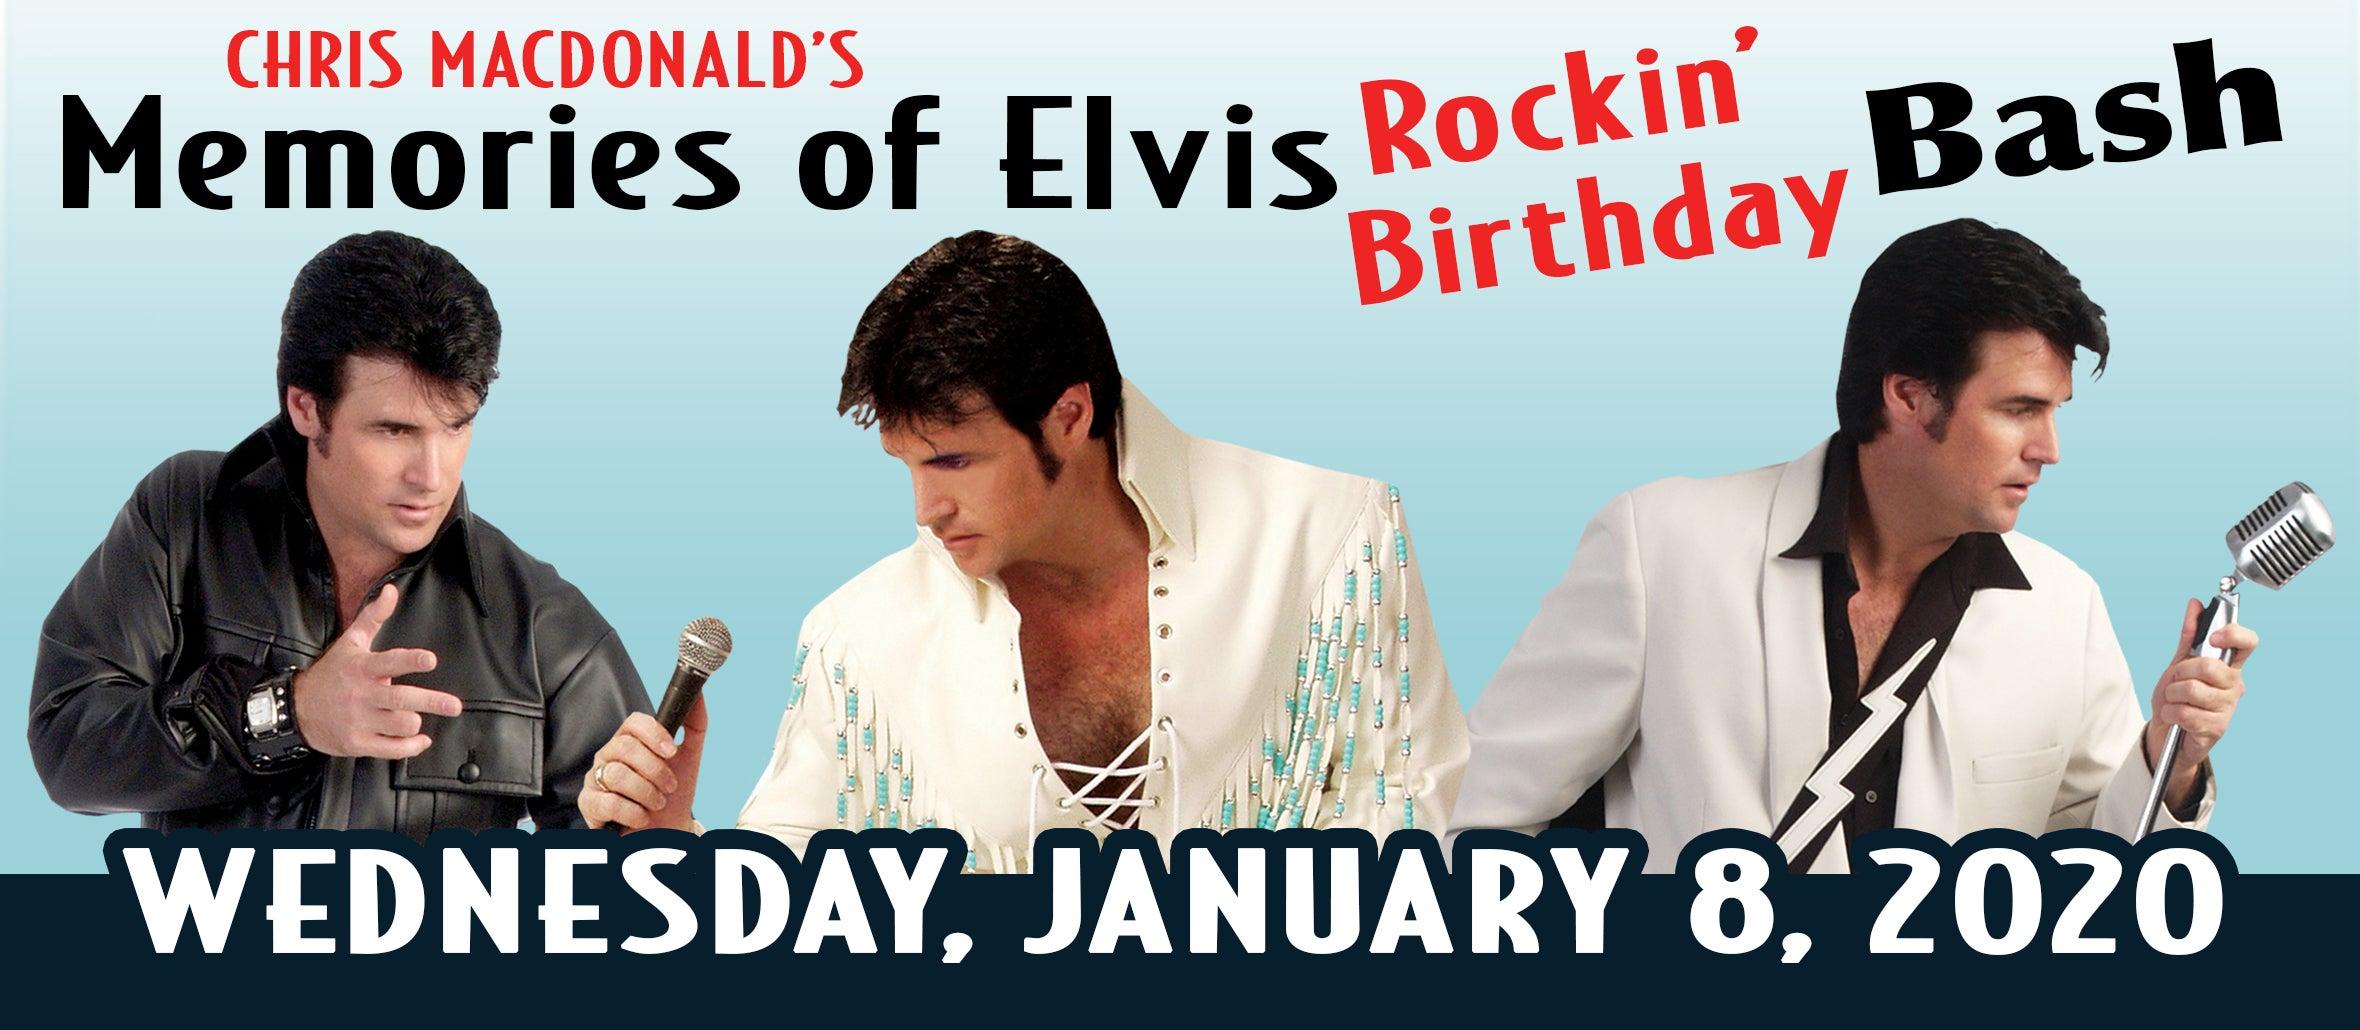 Chris MacDonald's Memories of Elvis Rockin' Birthday Bash